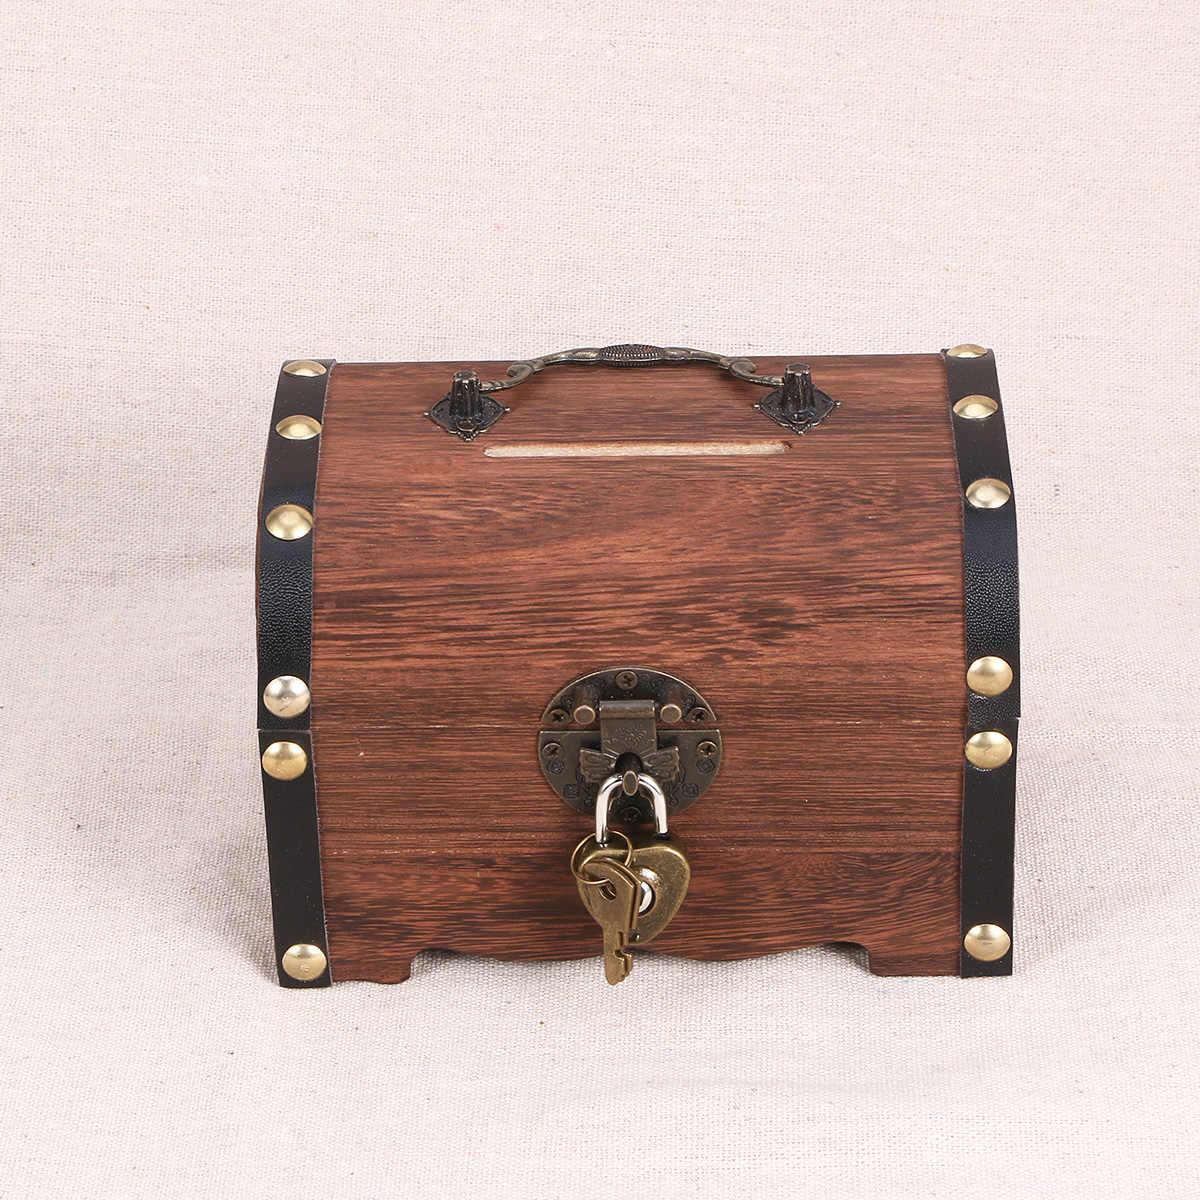 VINTAGE Treasure กล่องเก็บ Pirate Treasure Chest Piggy Bank Organizer กล่องประหยัดไฟล็อคสำหรับ Home